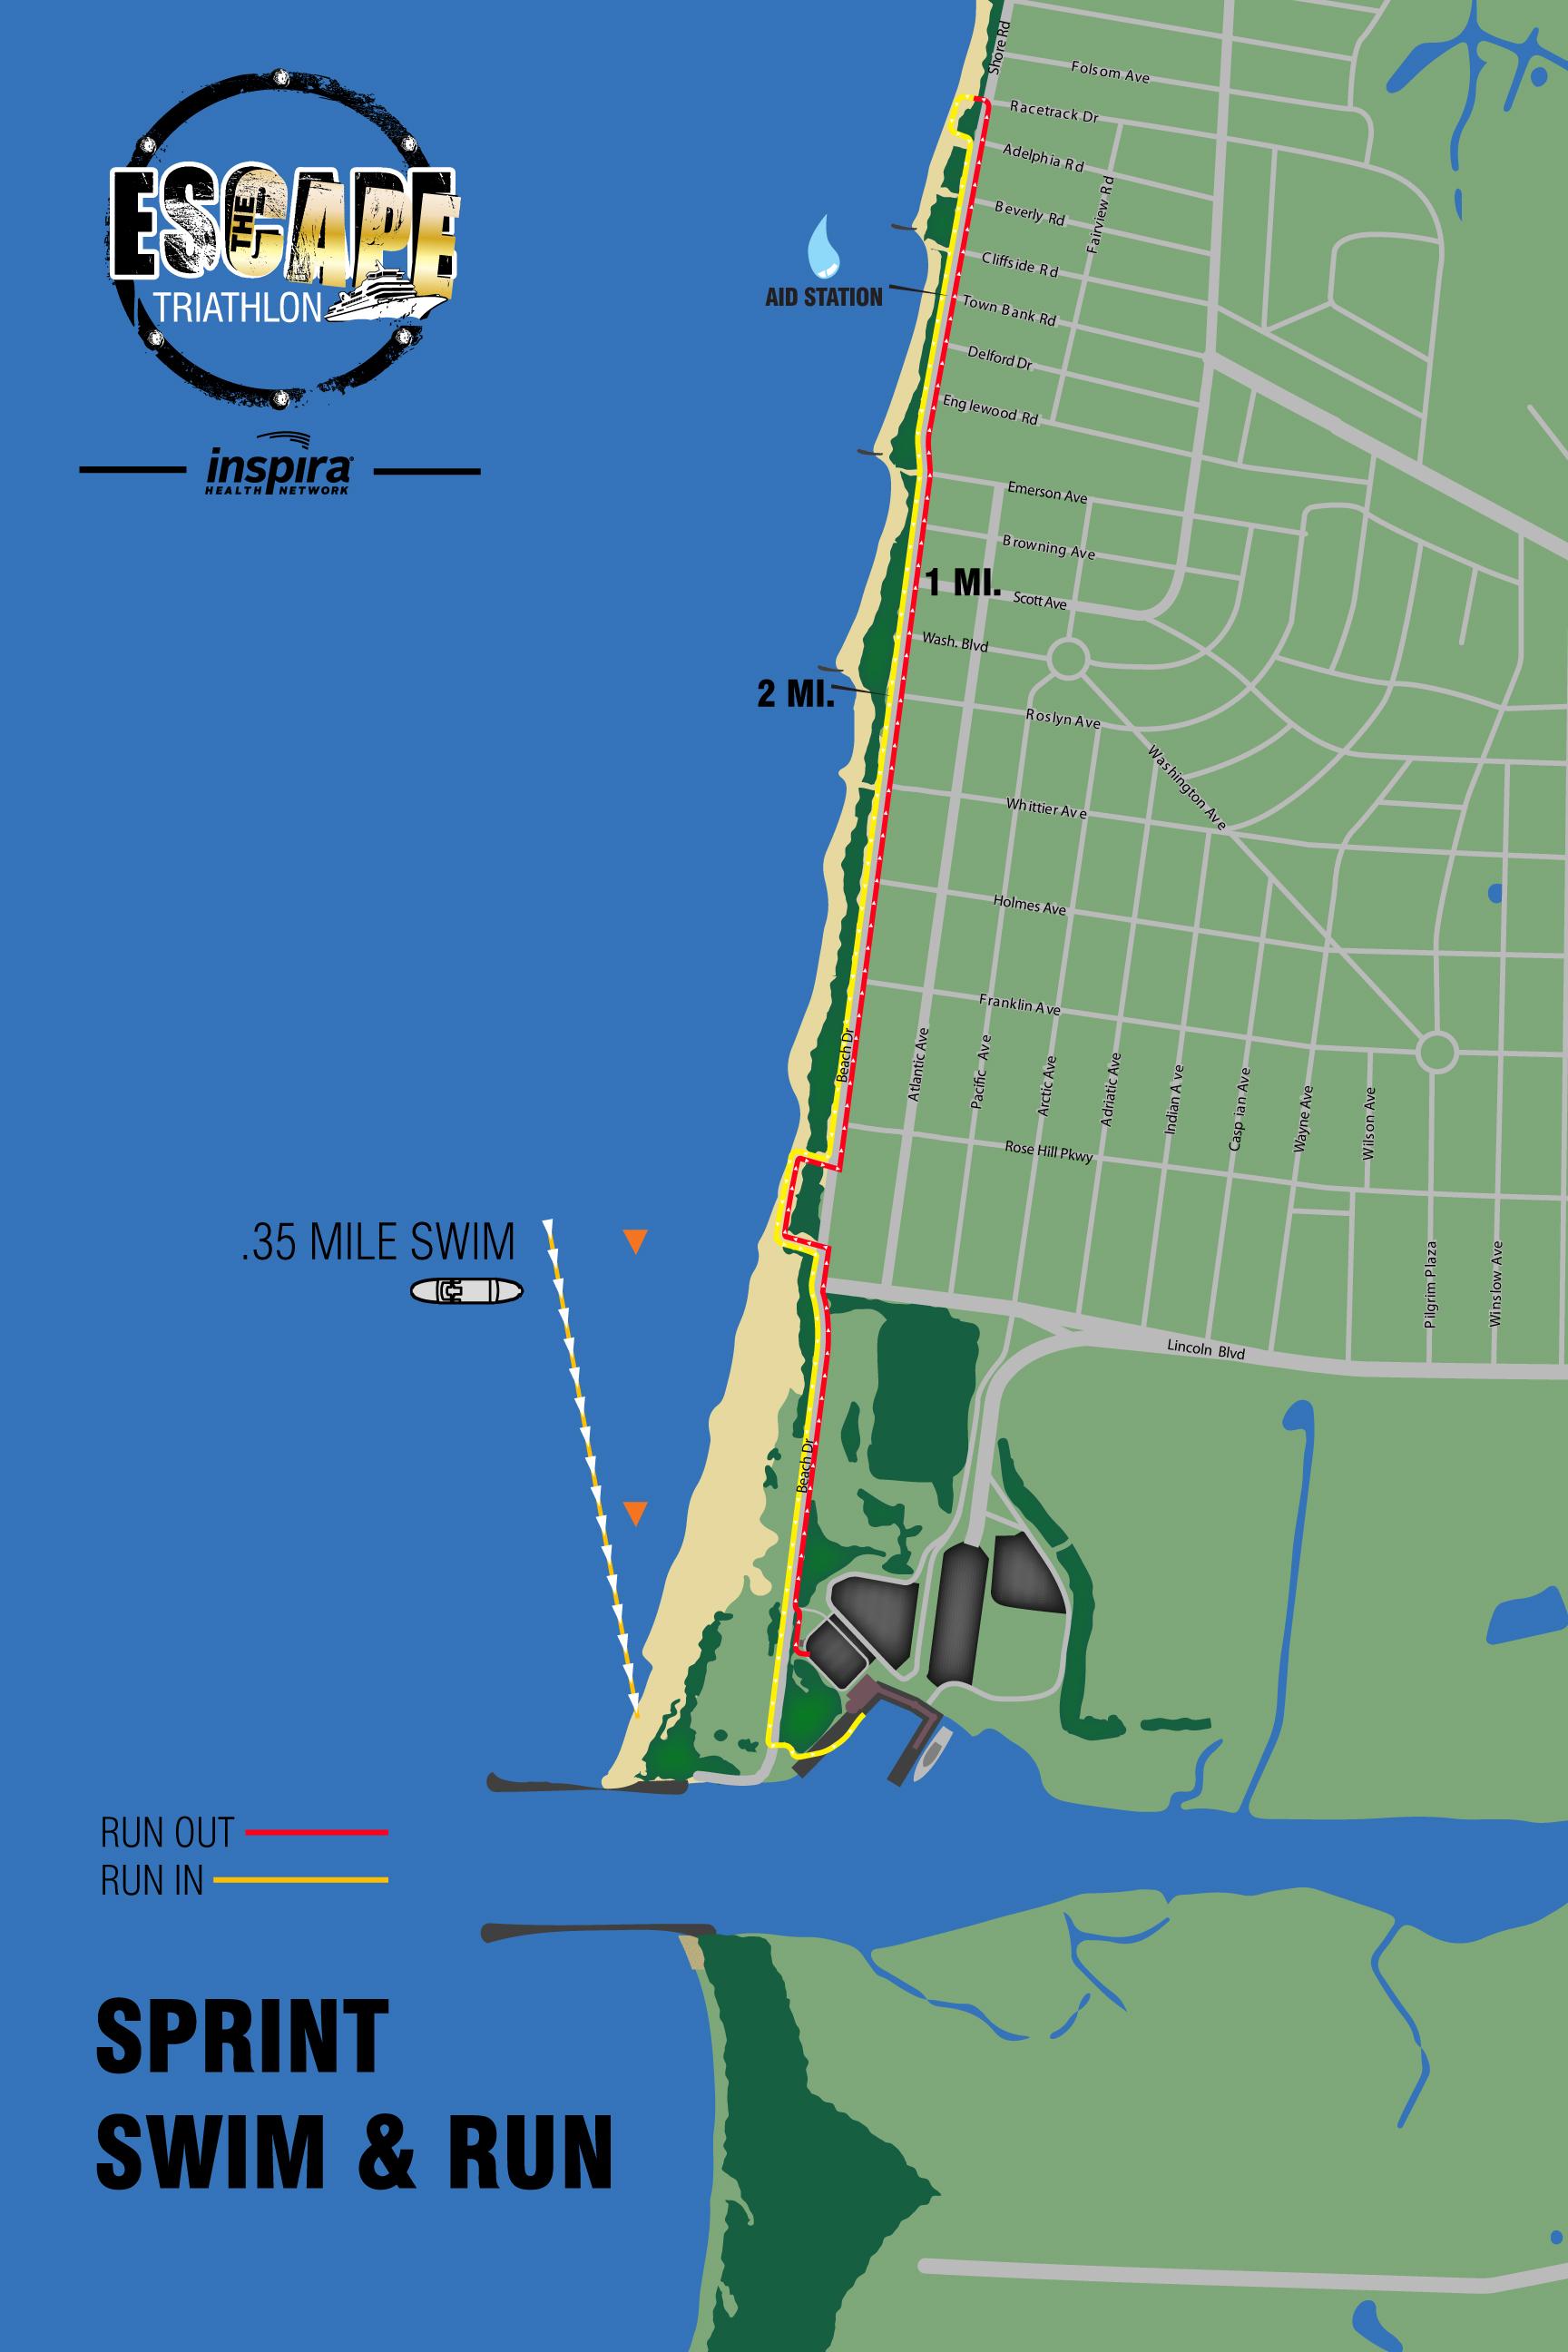 Swim &RunCourse Map (Sprint Triathlon)